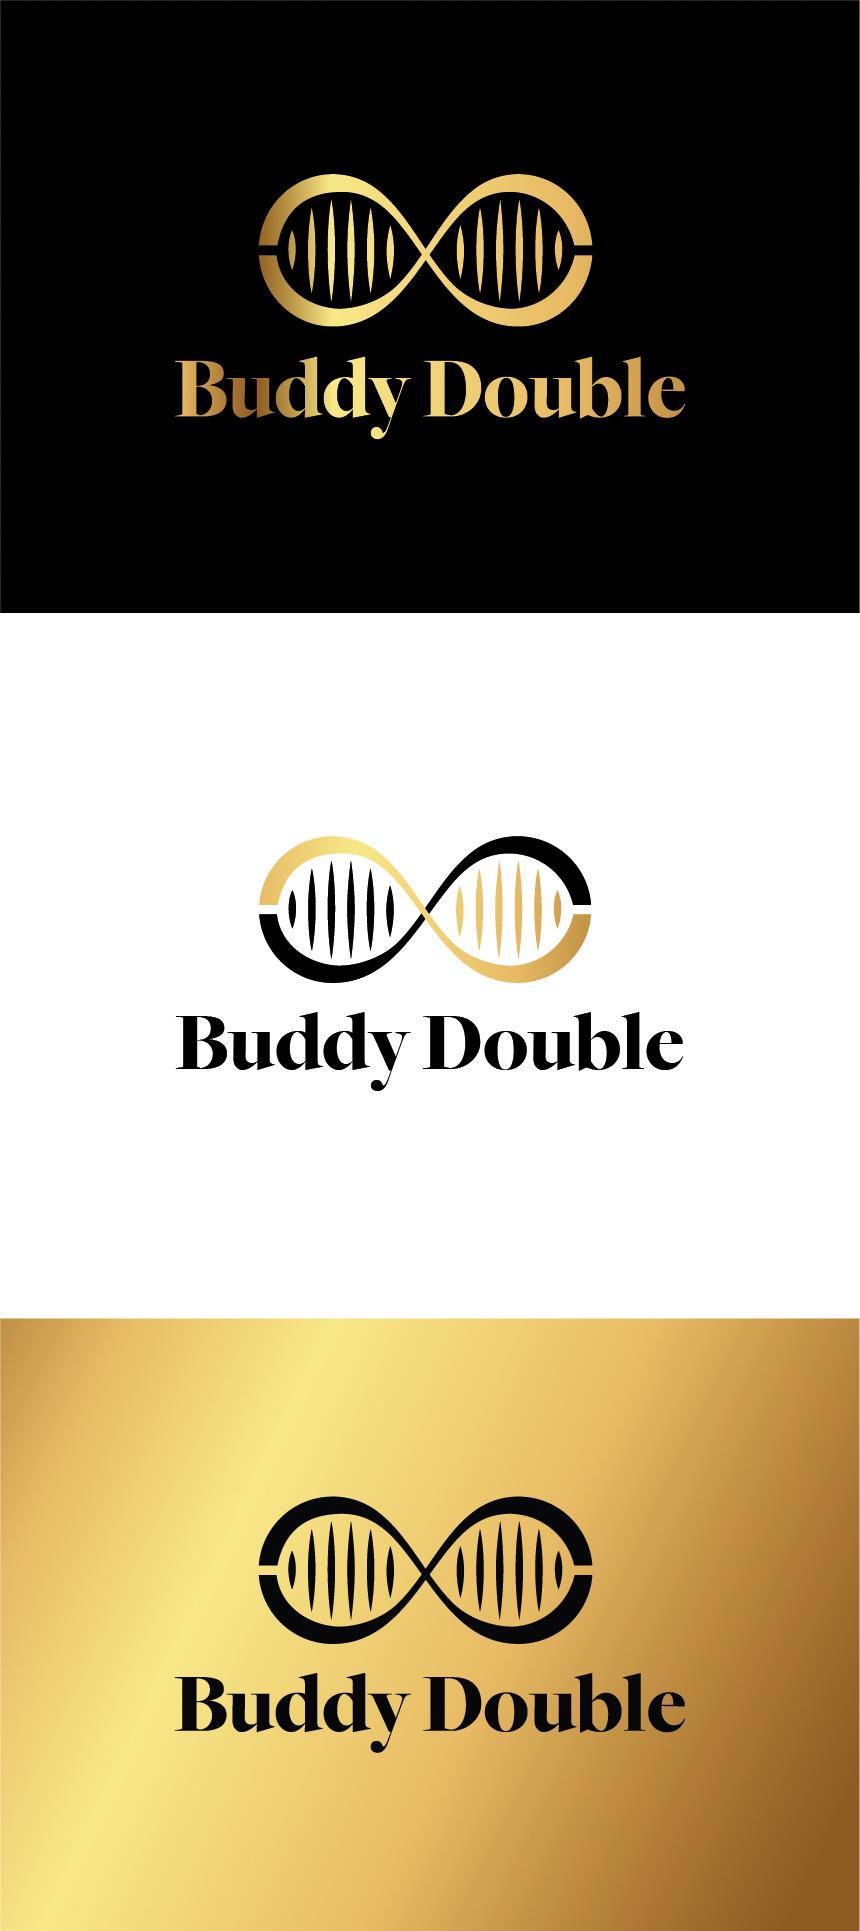 clonage animaux animal TFE Buddy Double double Buddy